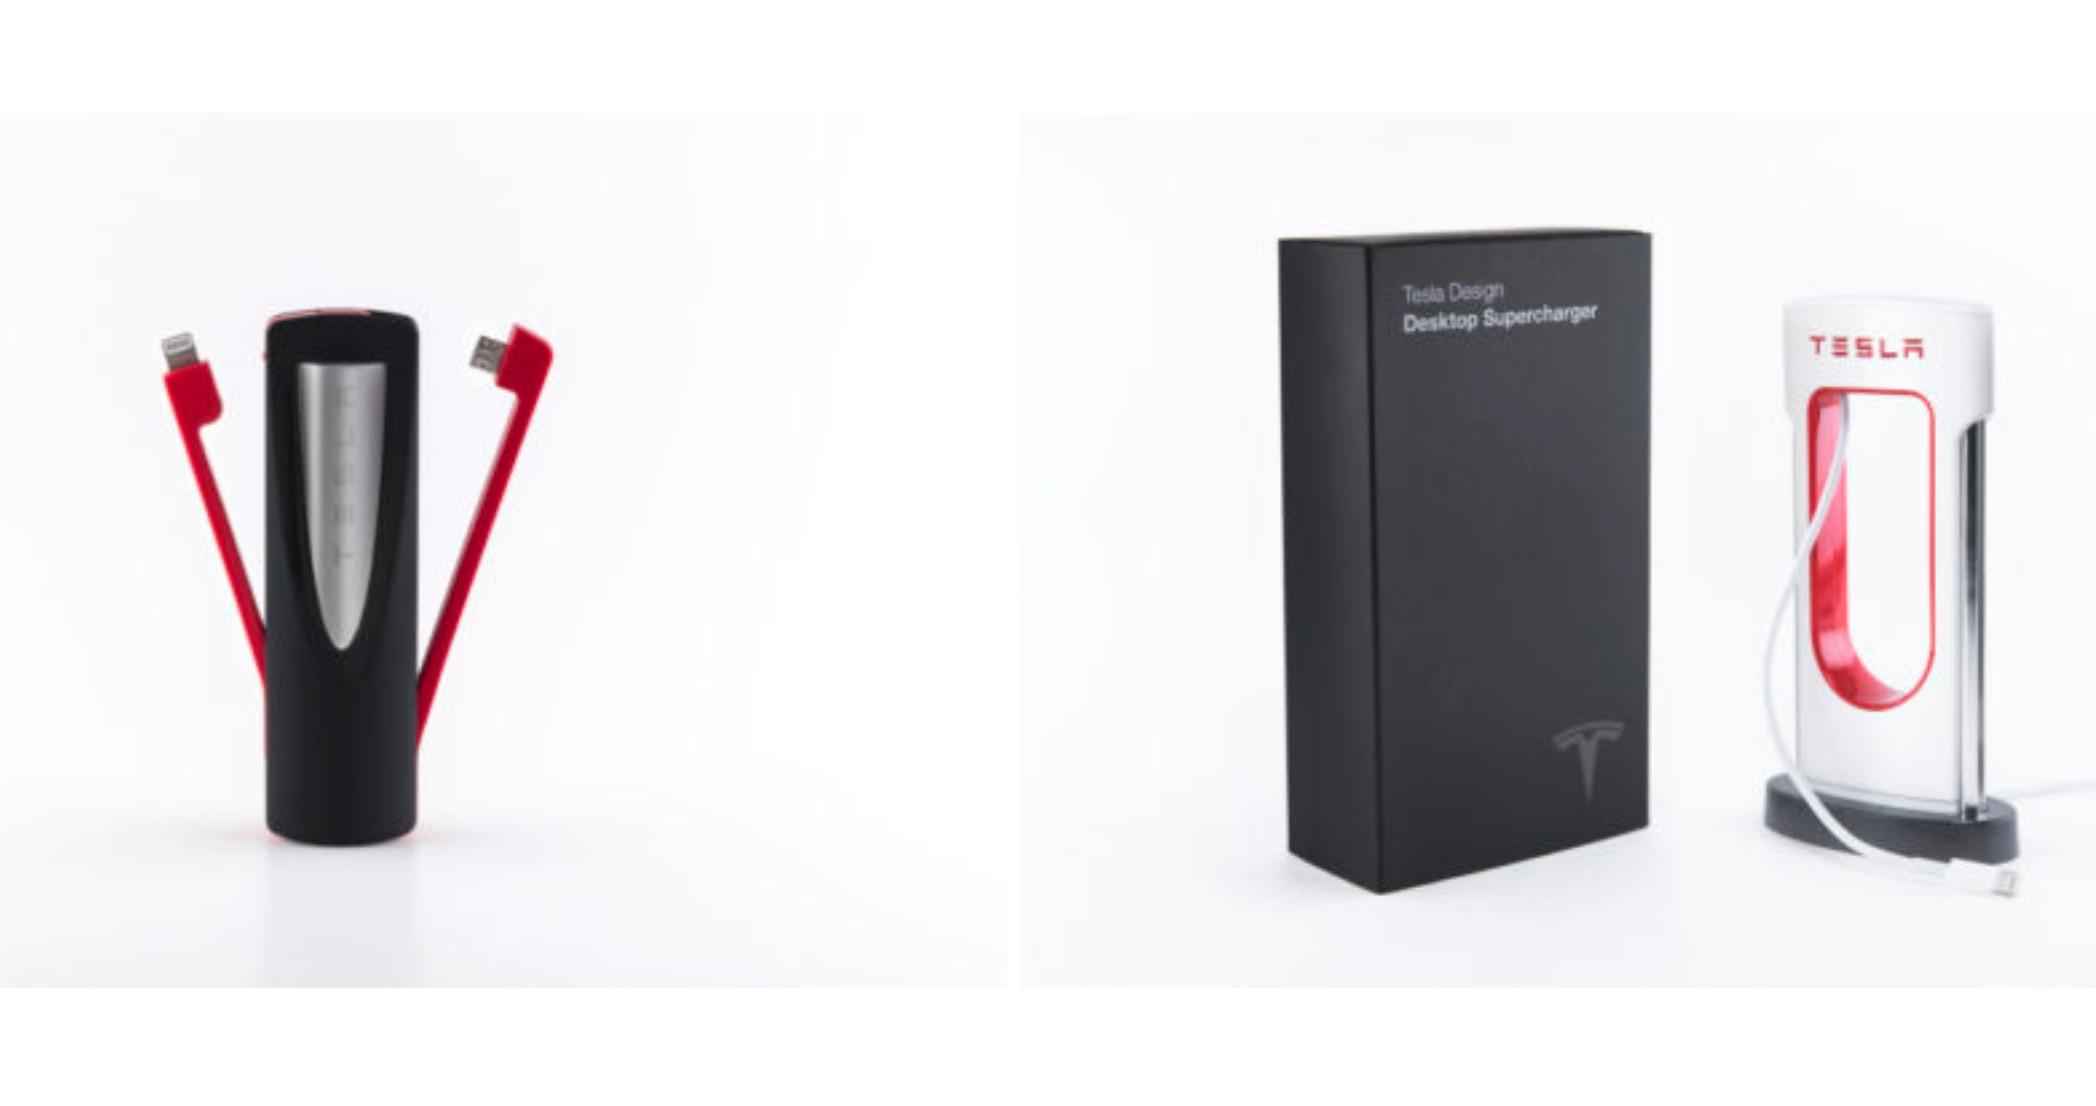 tesla-powerbank-desktop-supercharger-accessory